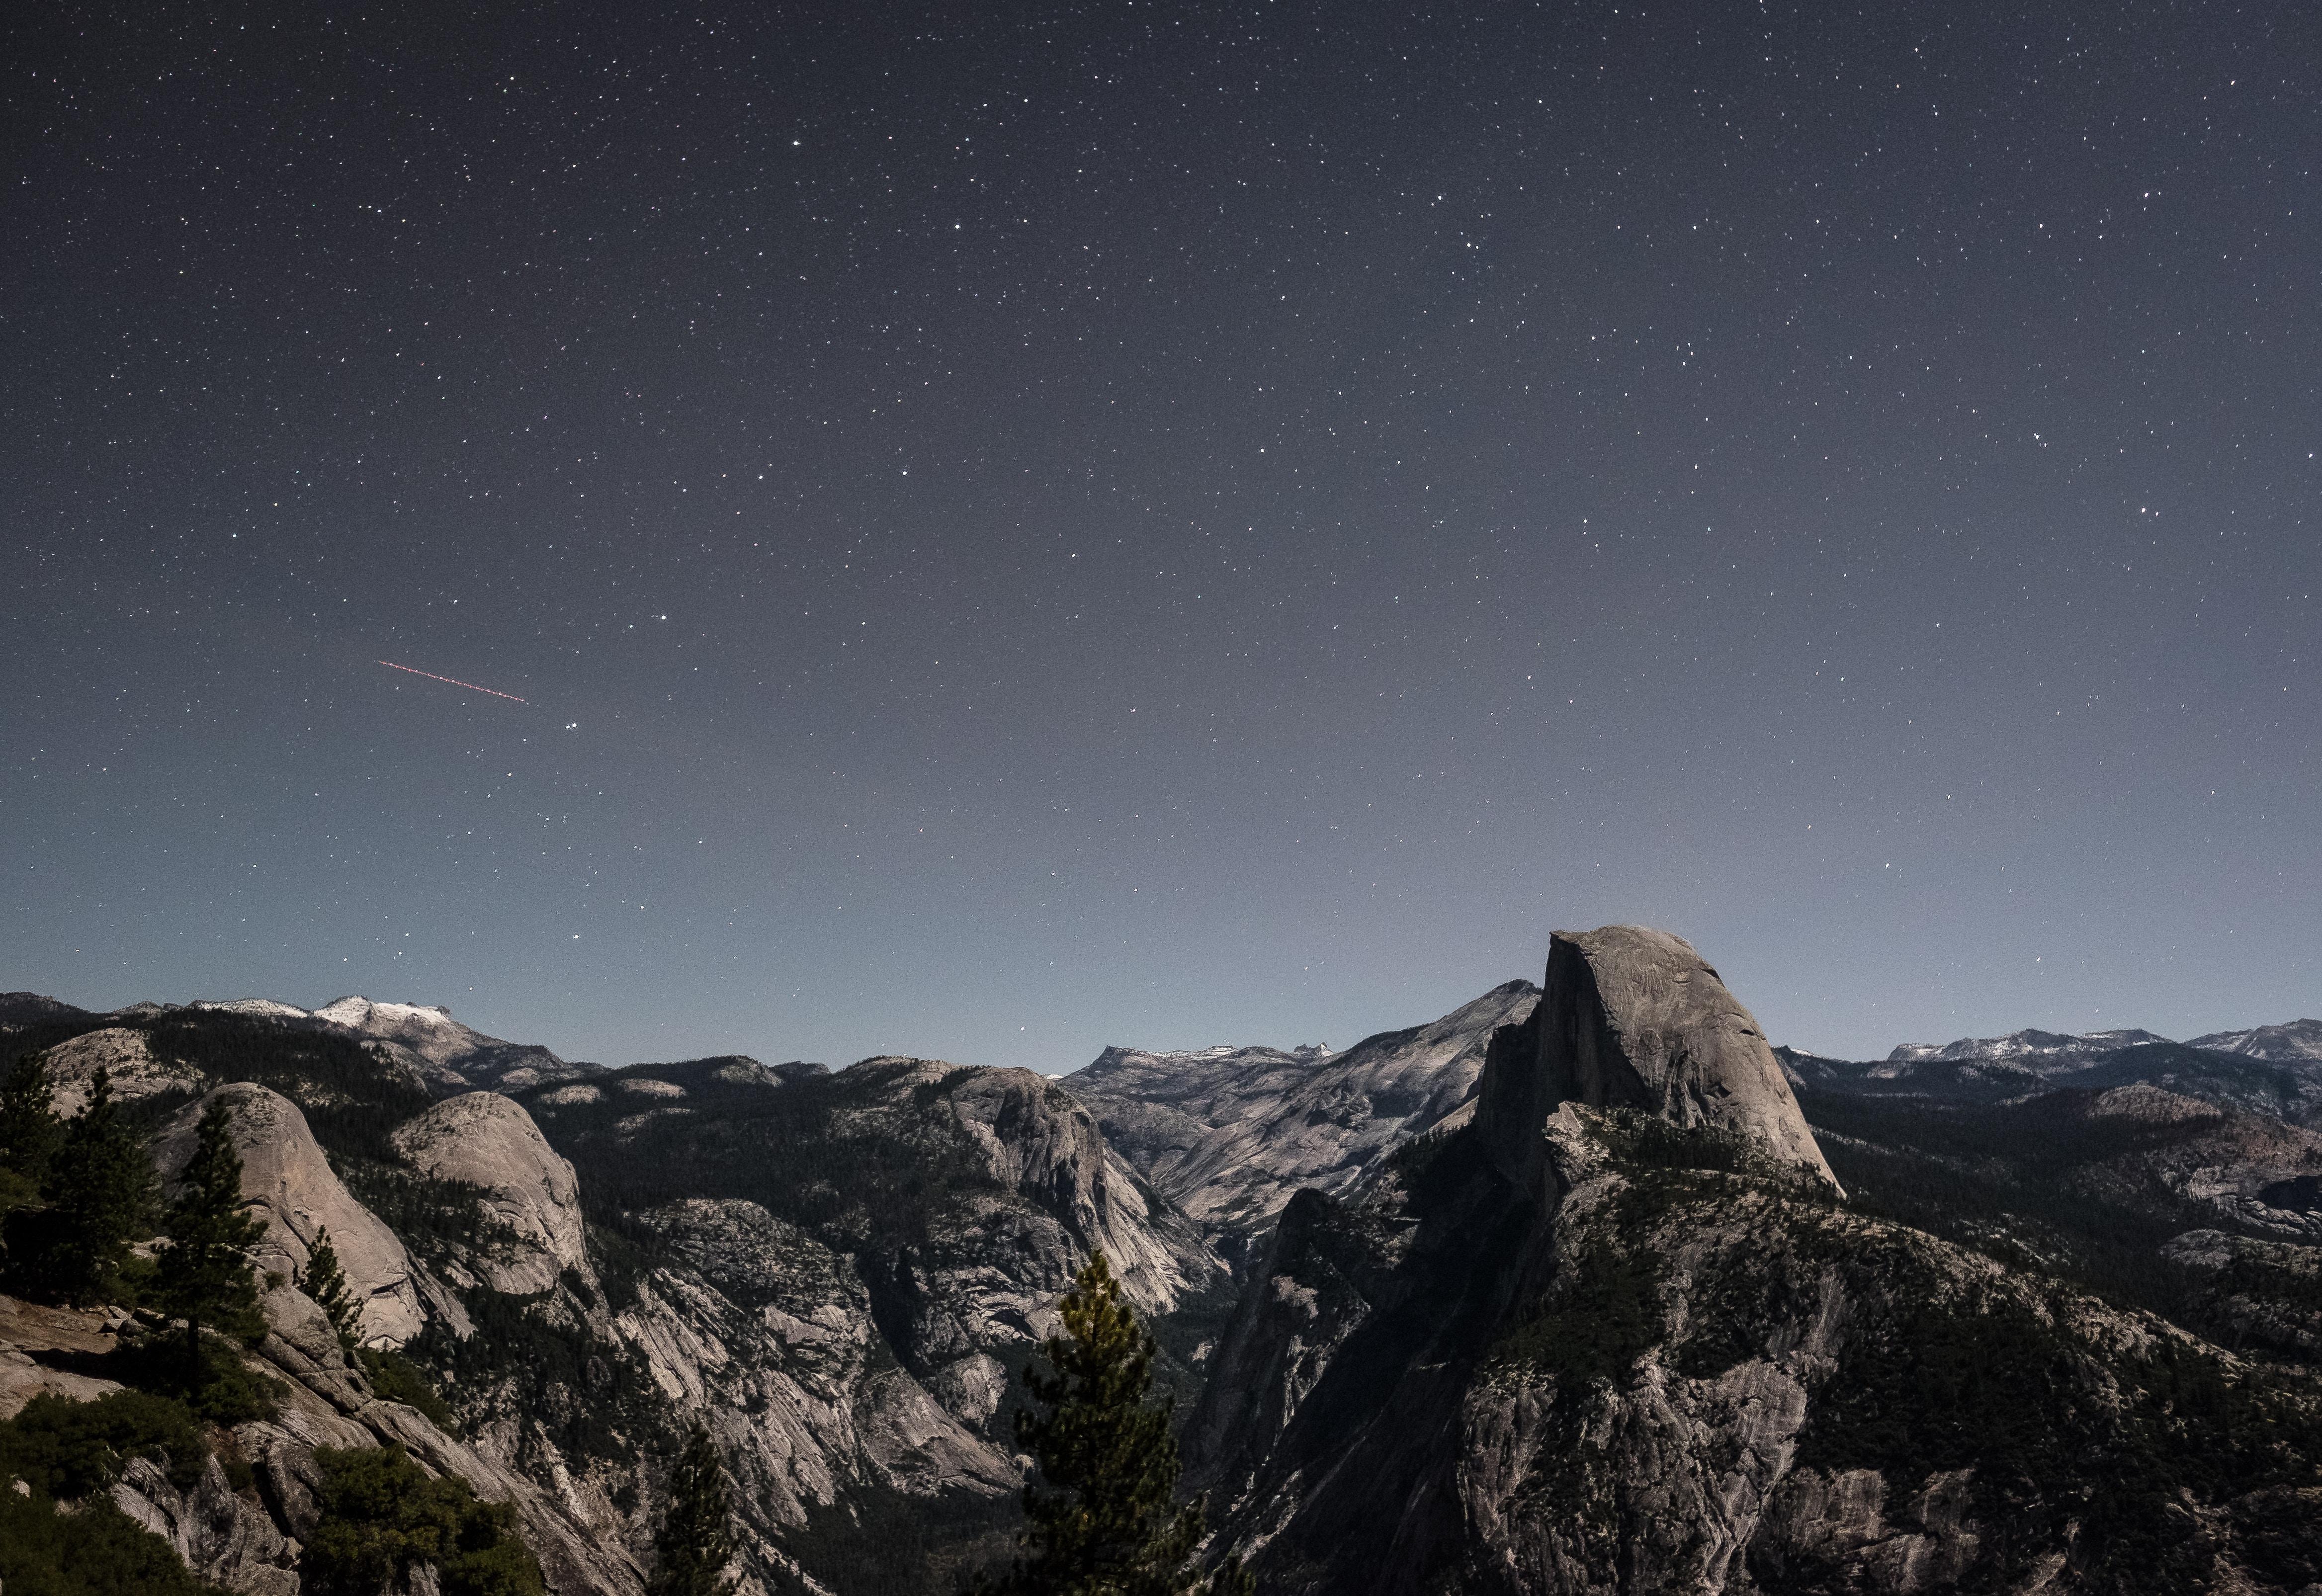 Yosemite National Park Rock Climbing Spots